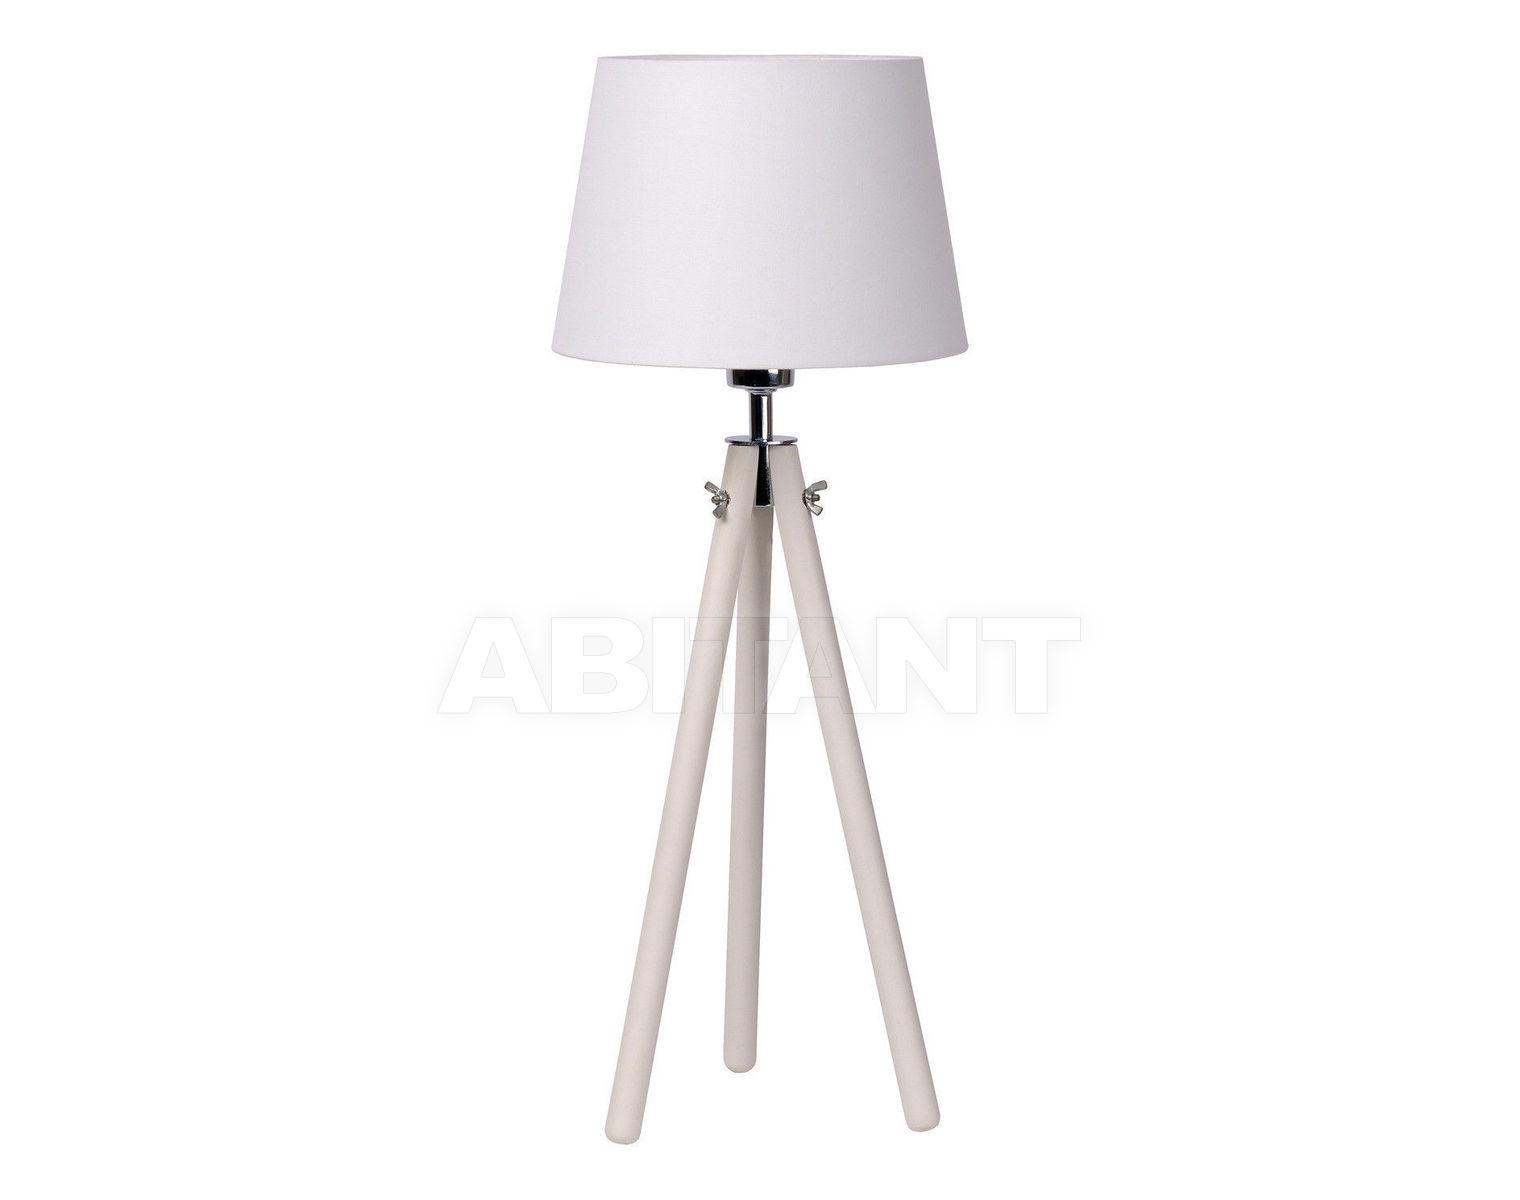 Купить Лампа настольная UMBRA Lucide  Floor & Table Lamps 24551/01/31